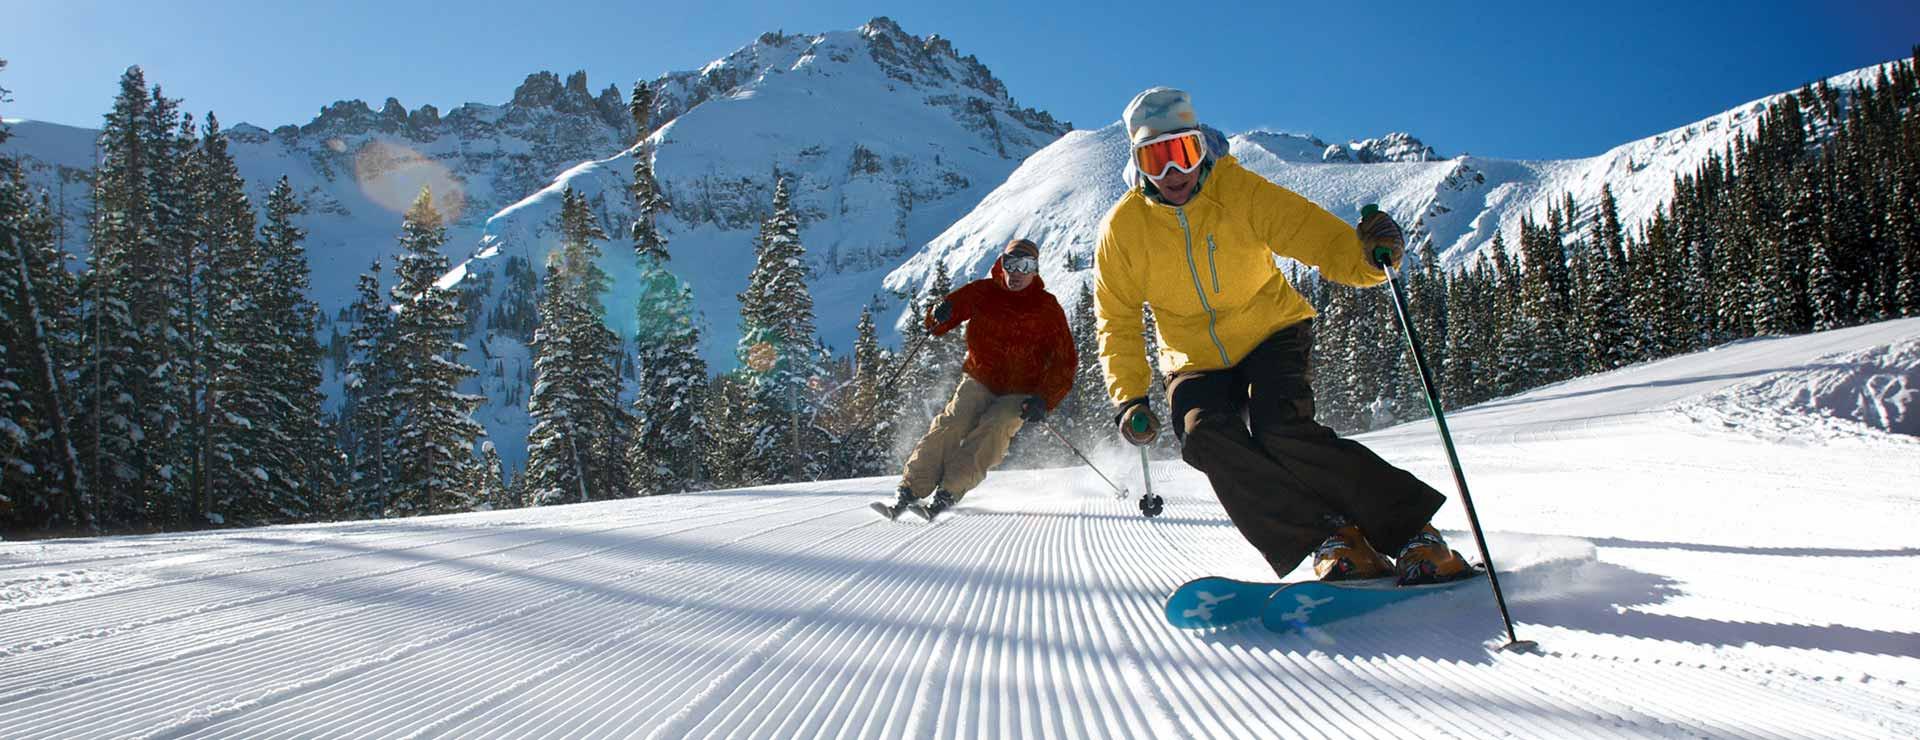 corduroy-skiers-1920x740.jpg